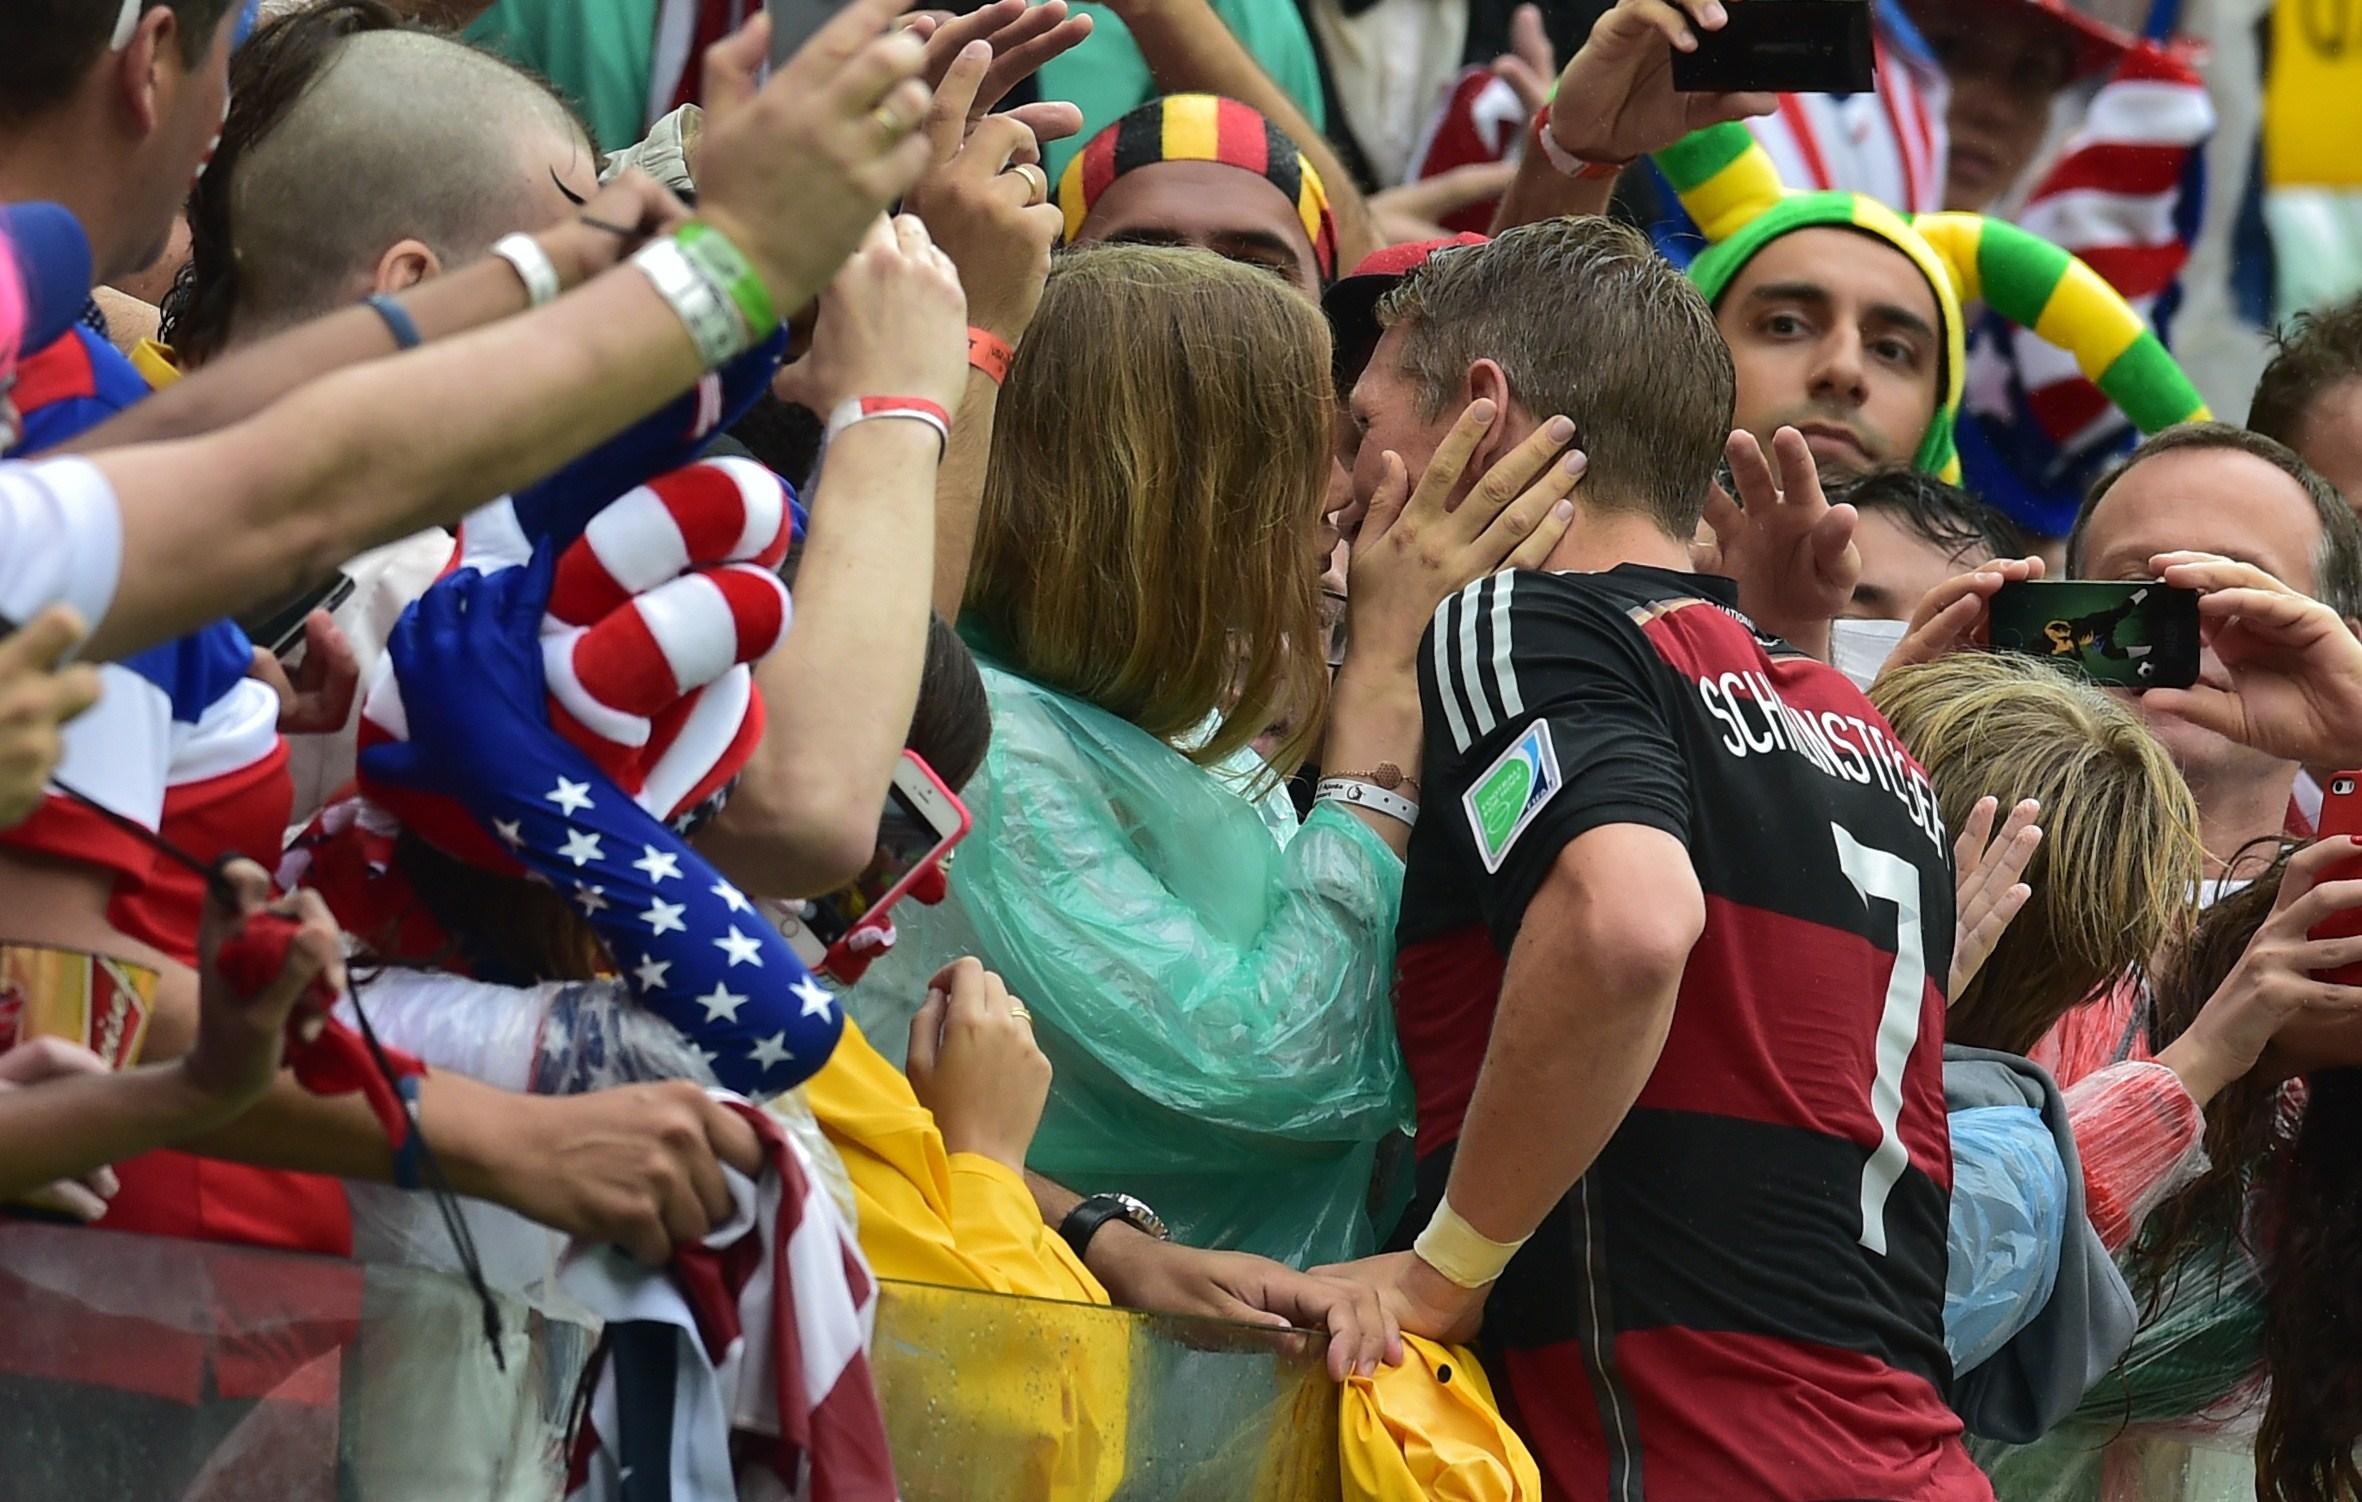 Sarah Brandner kisses boyfriend Bastian Schweinsteiger after Germany's Group Stage win over USA, 6/26/2014